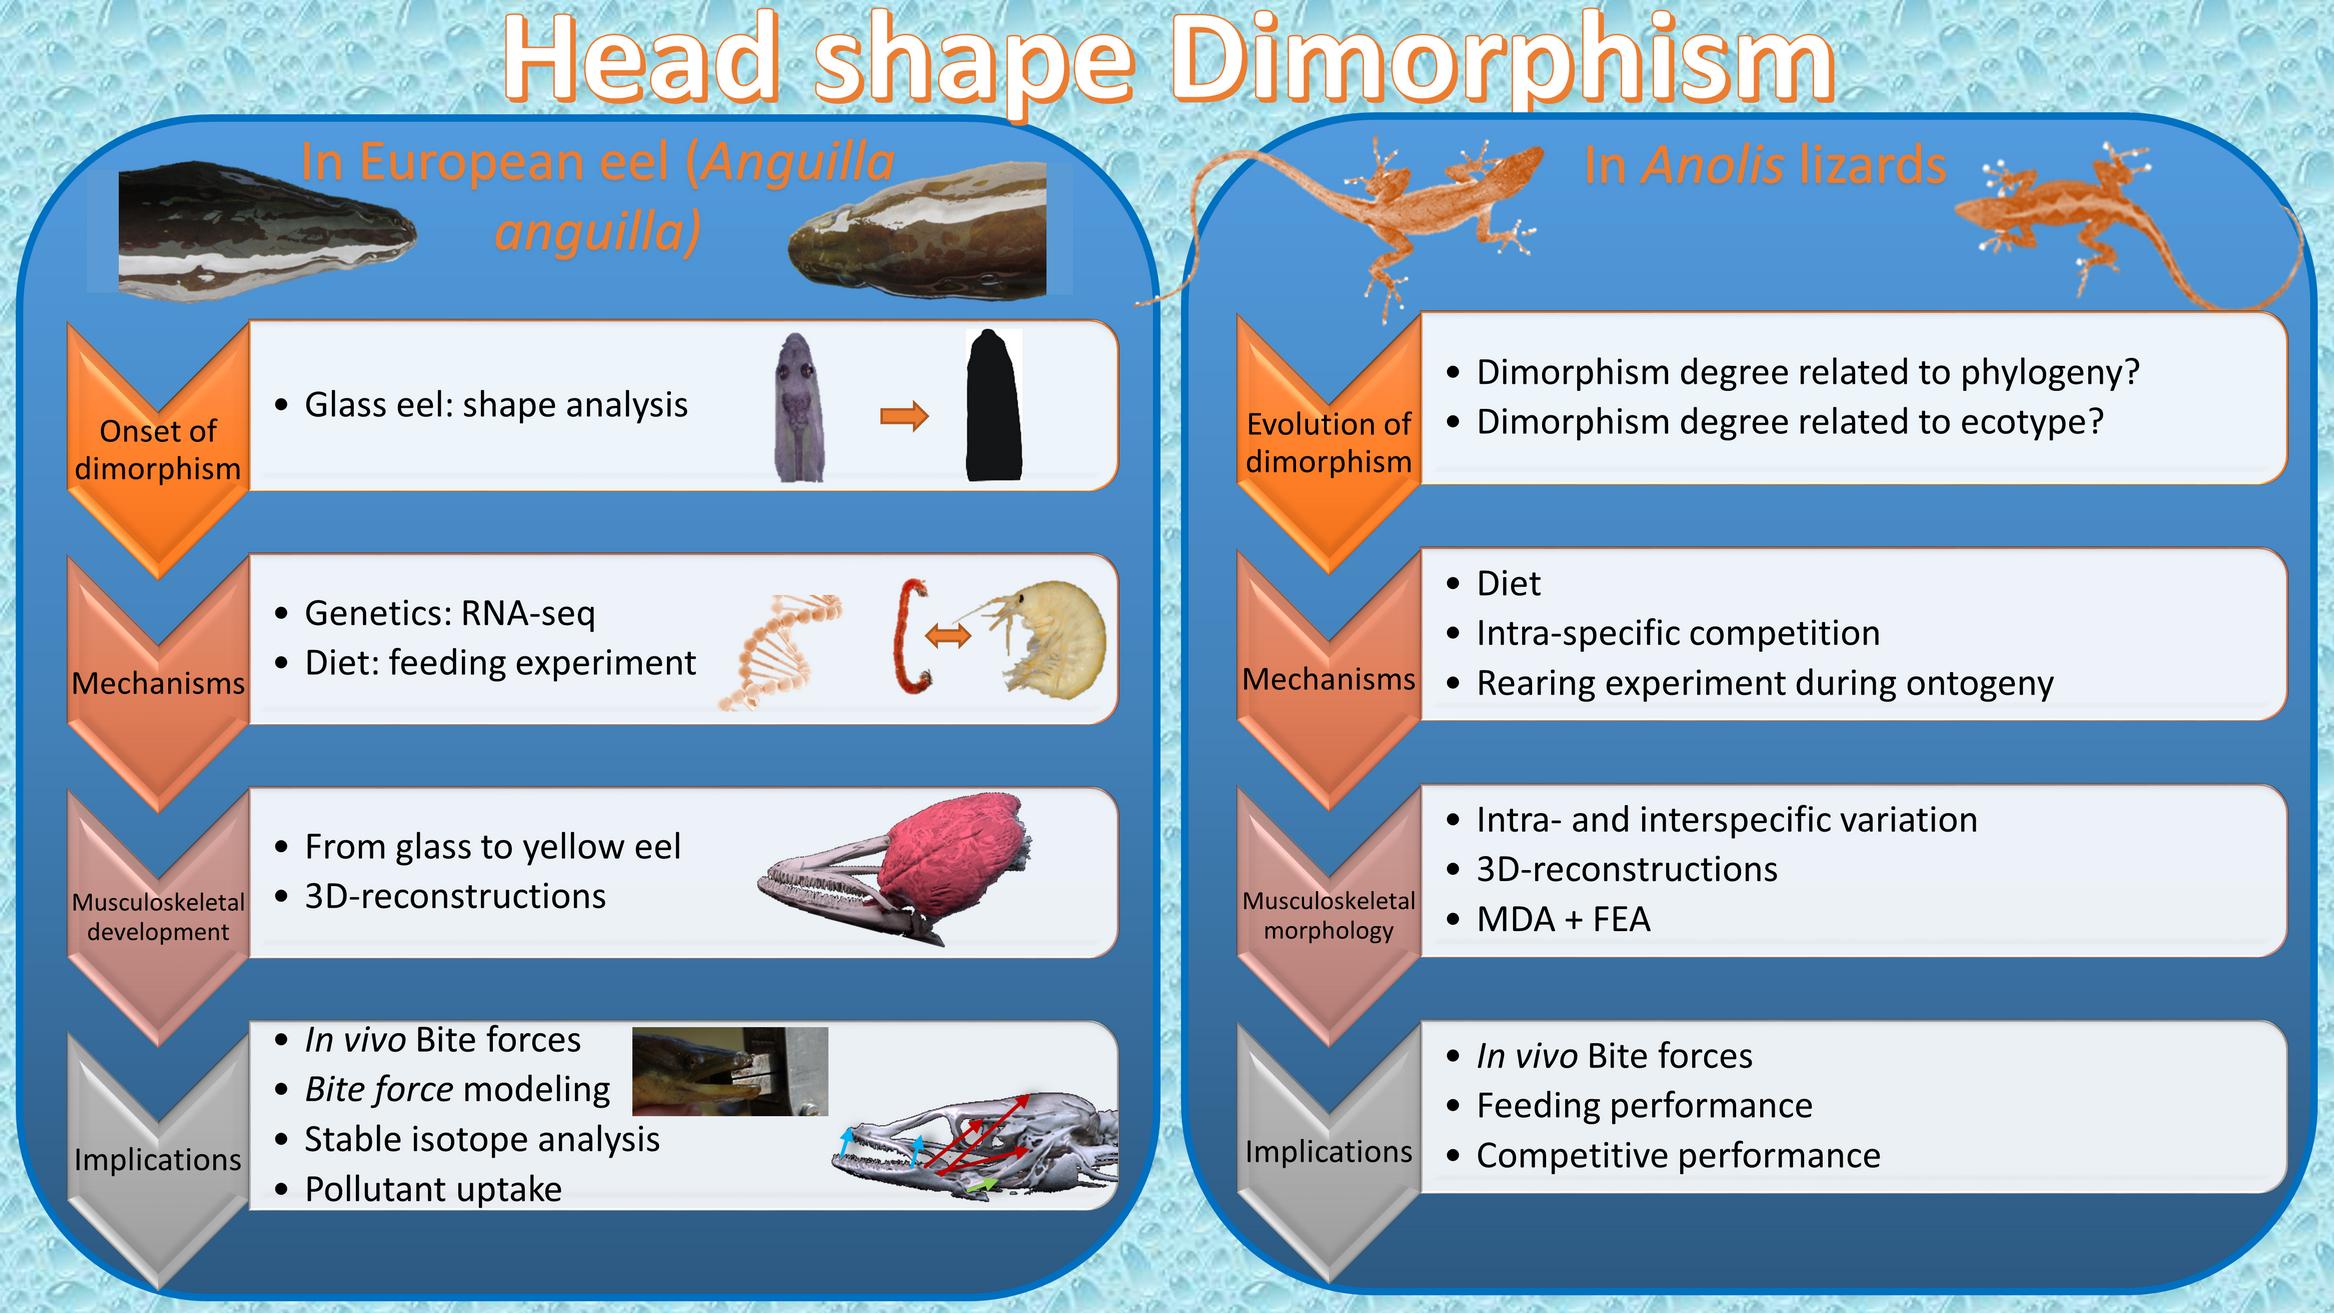 Head shape dimorphism